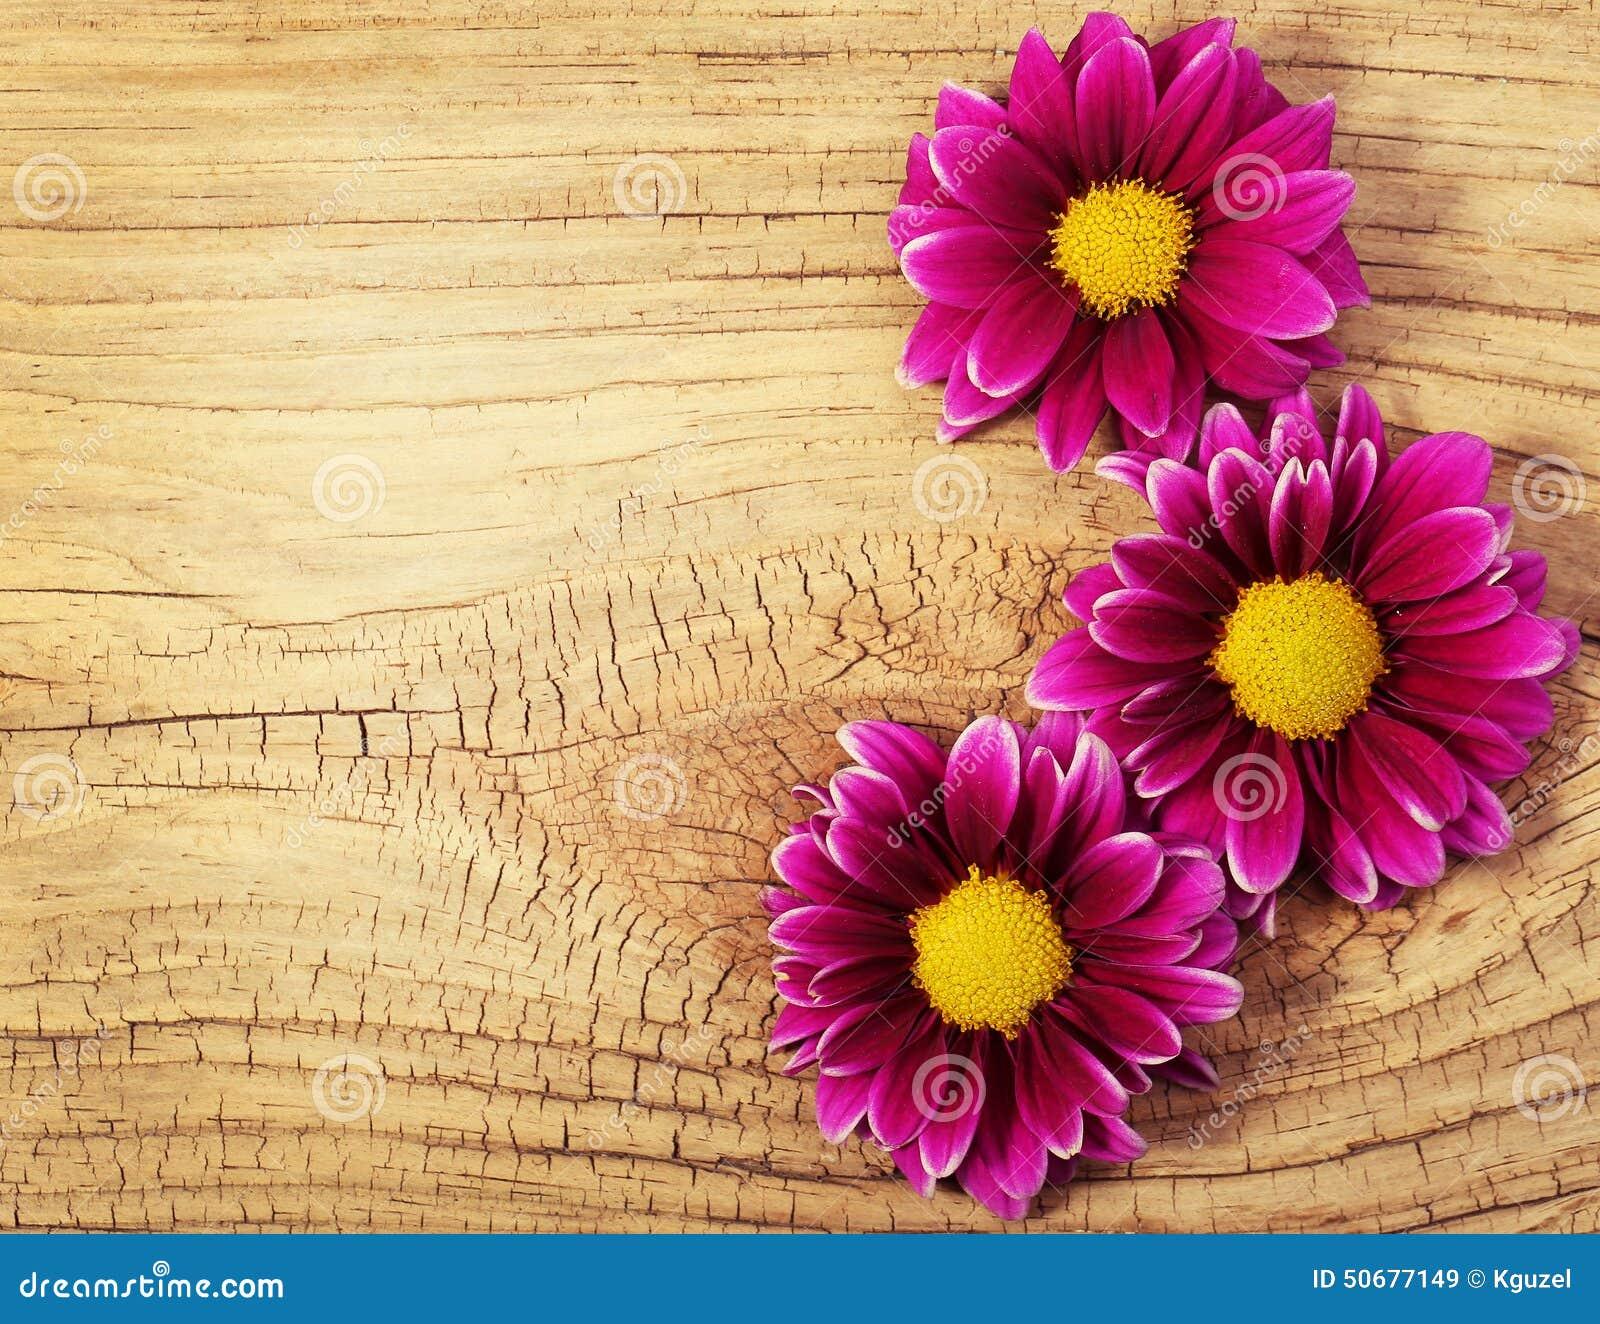 Download 在木背景的洋红色菊花花 库存图片. 图片 包括有 黄色, 开花的, 没人, 工厂, 伯根地酒, 开花, 生气勃勃 - 50677149